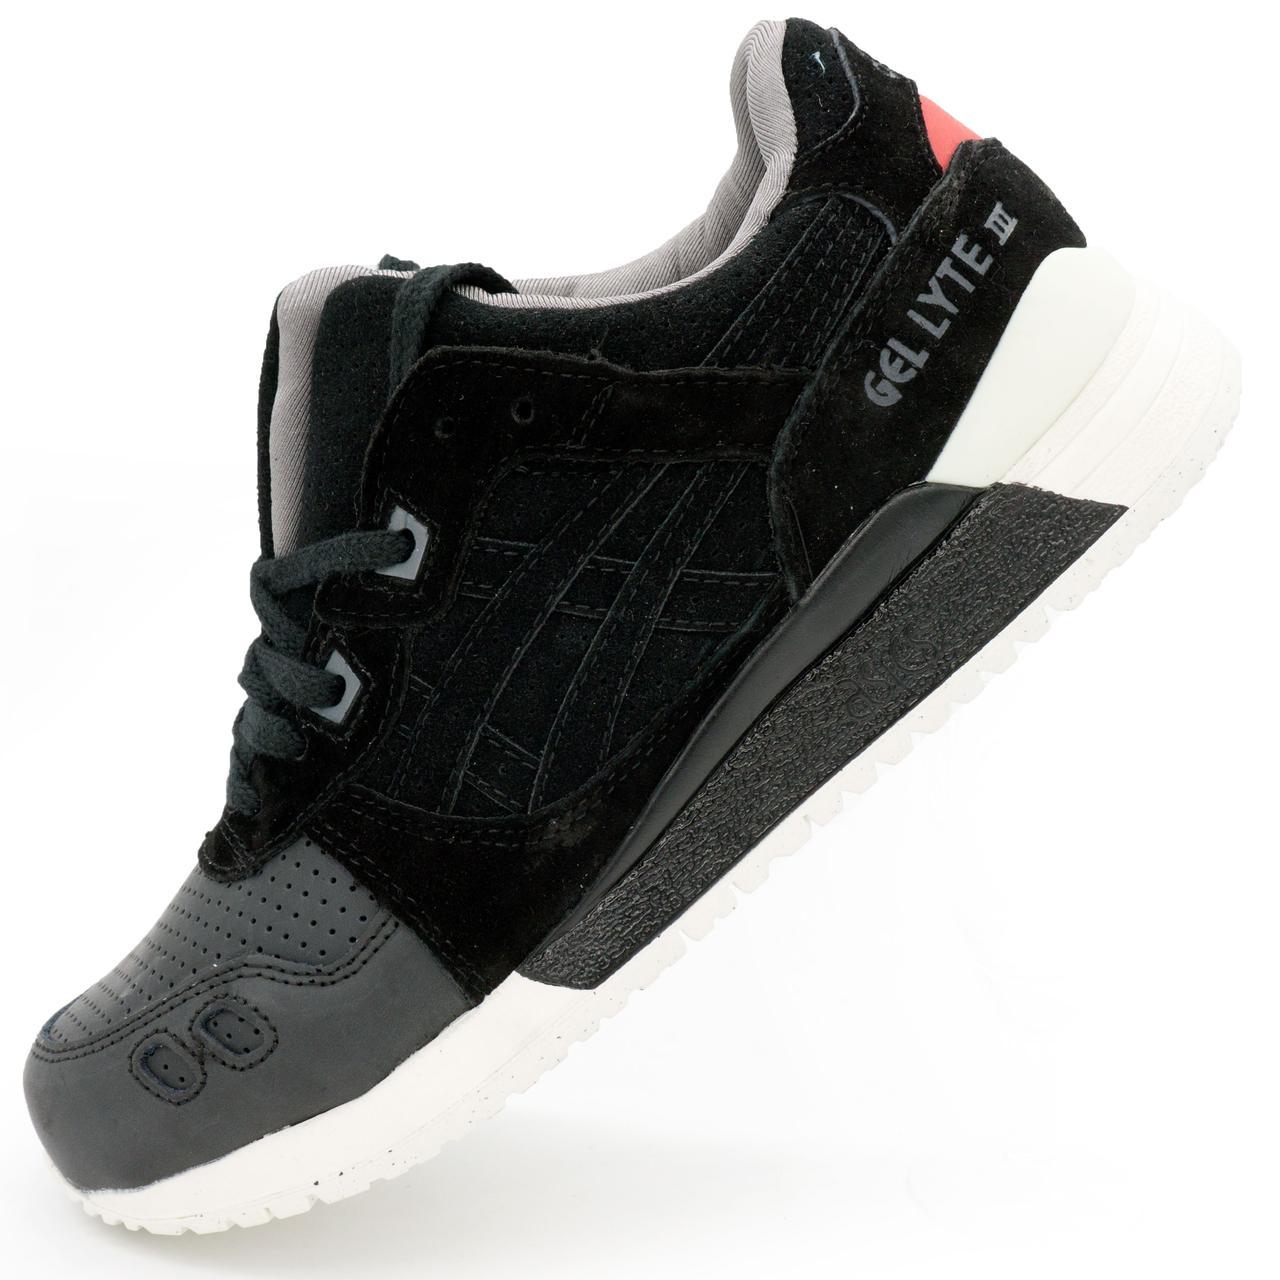 bbb802c3 Черные мужские и женские кроссовки Асикс Asics Gel Lyte 3 натурал кожа р.(42